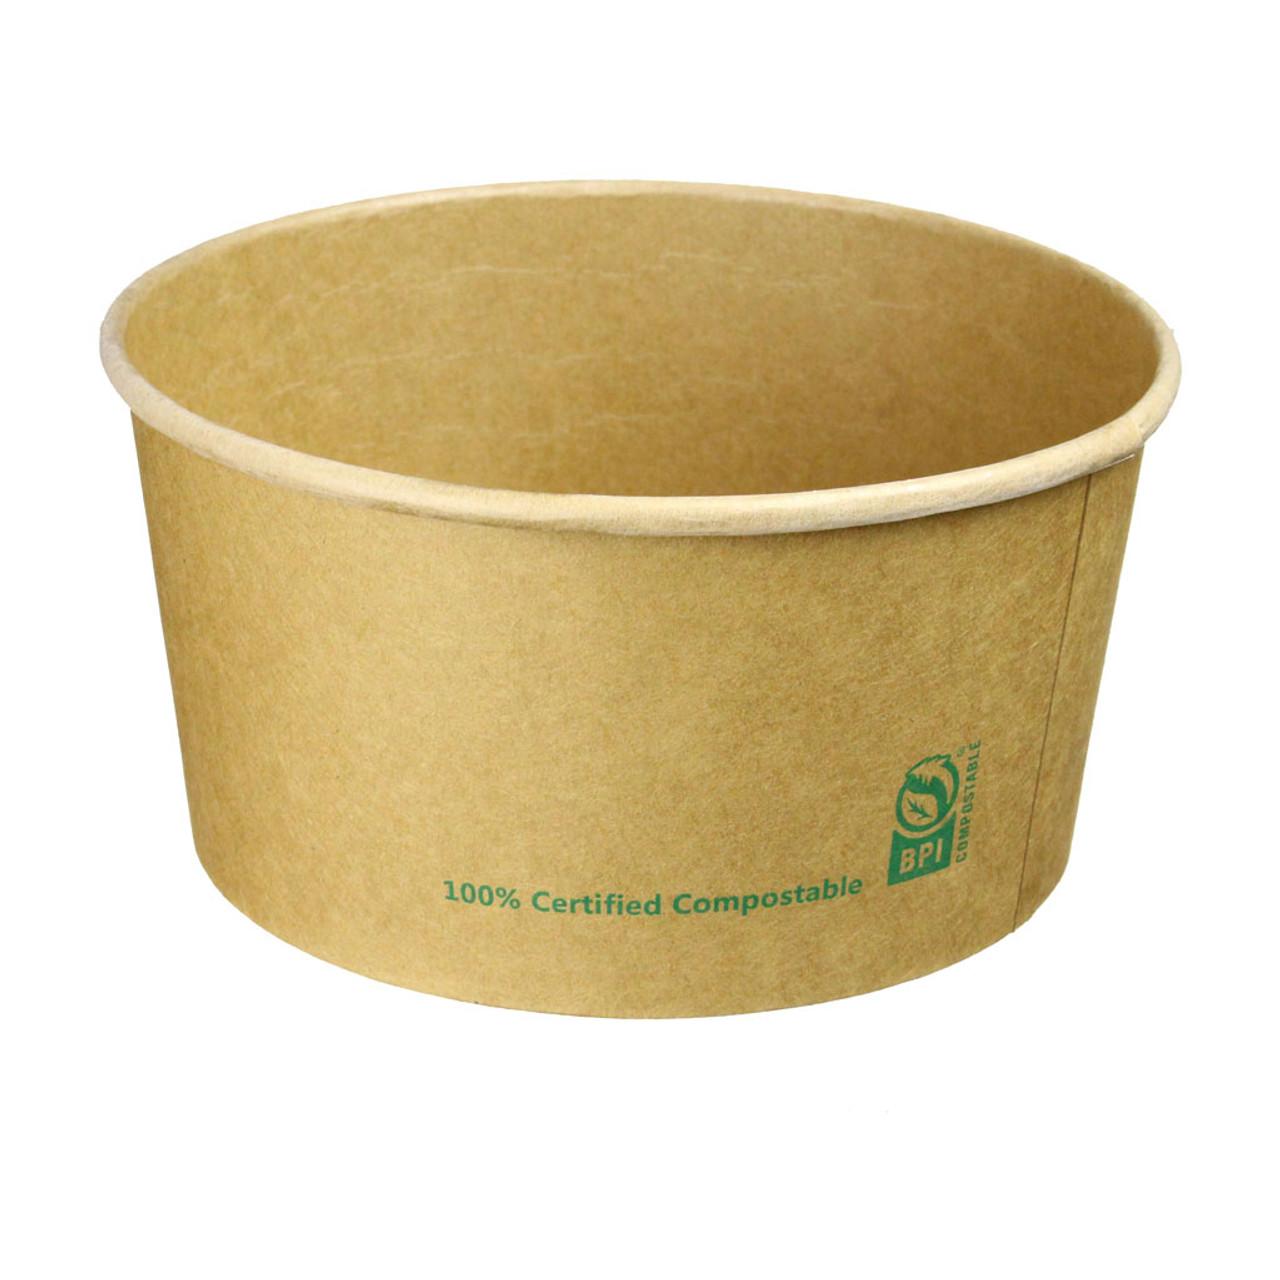 32oz Compostable Paper Salad Bowl